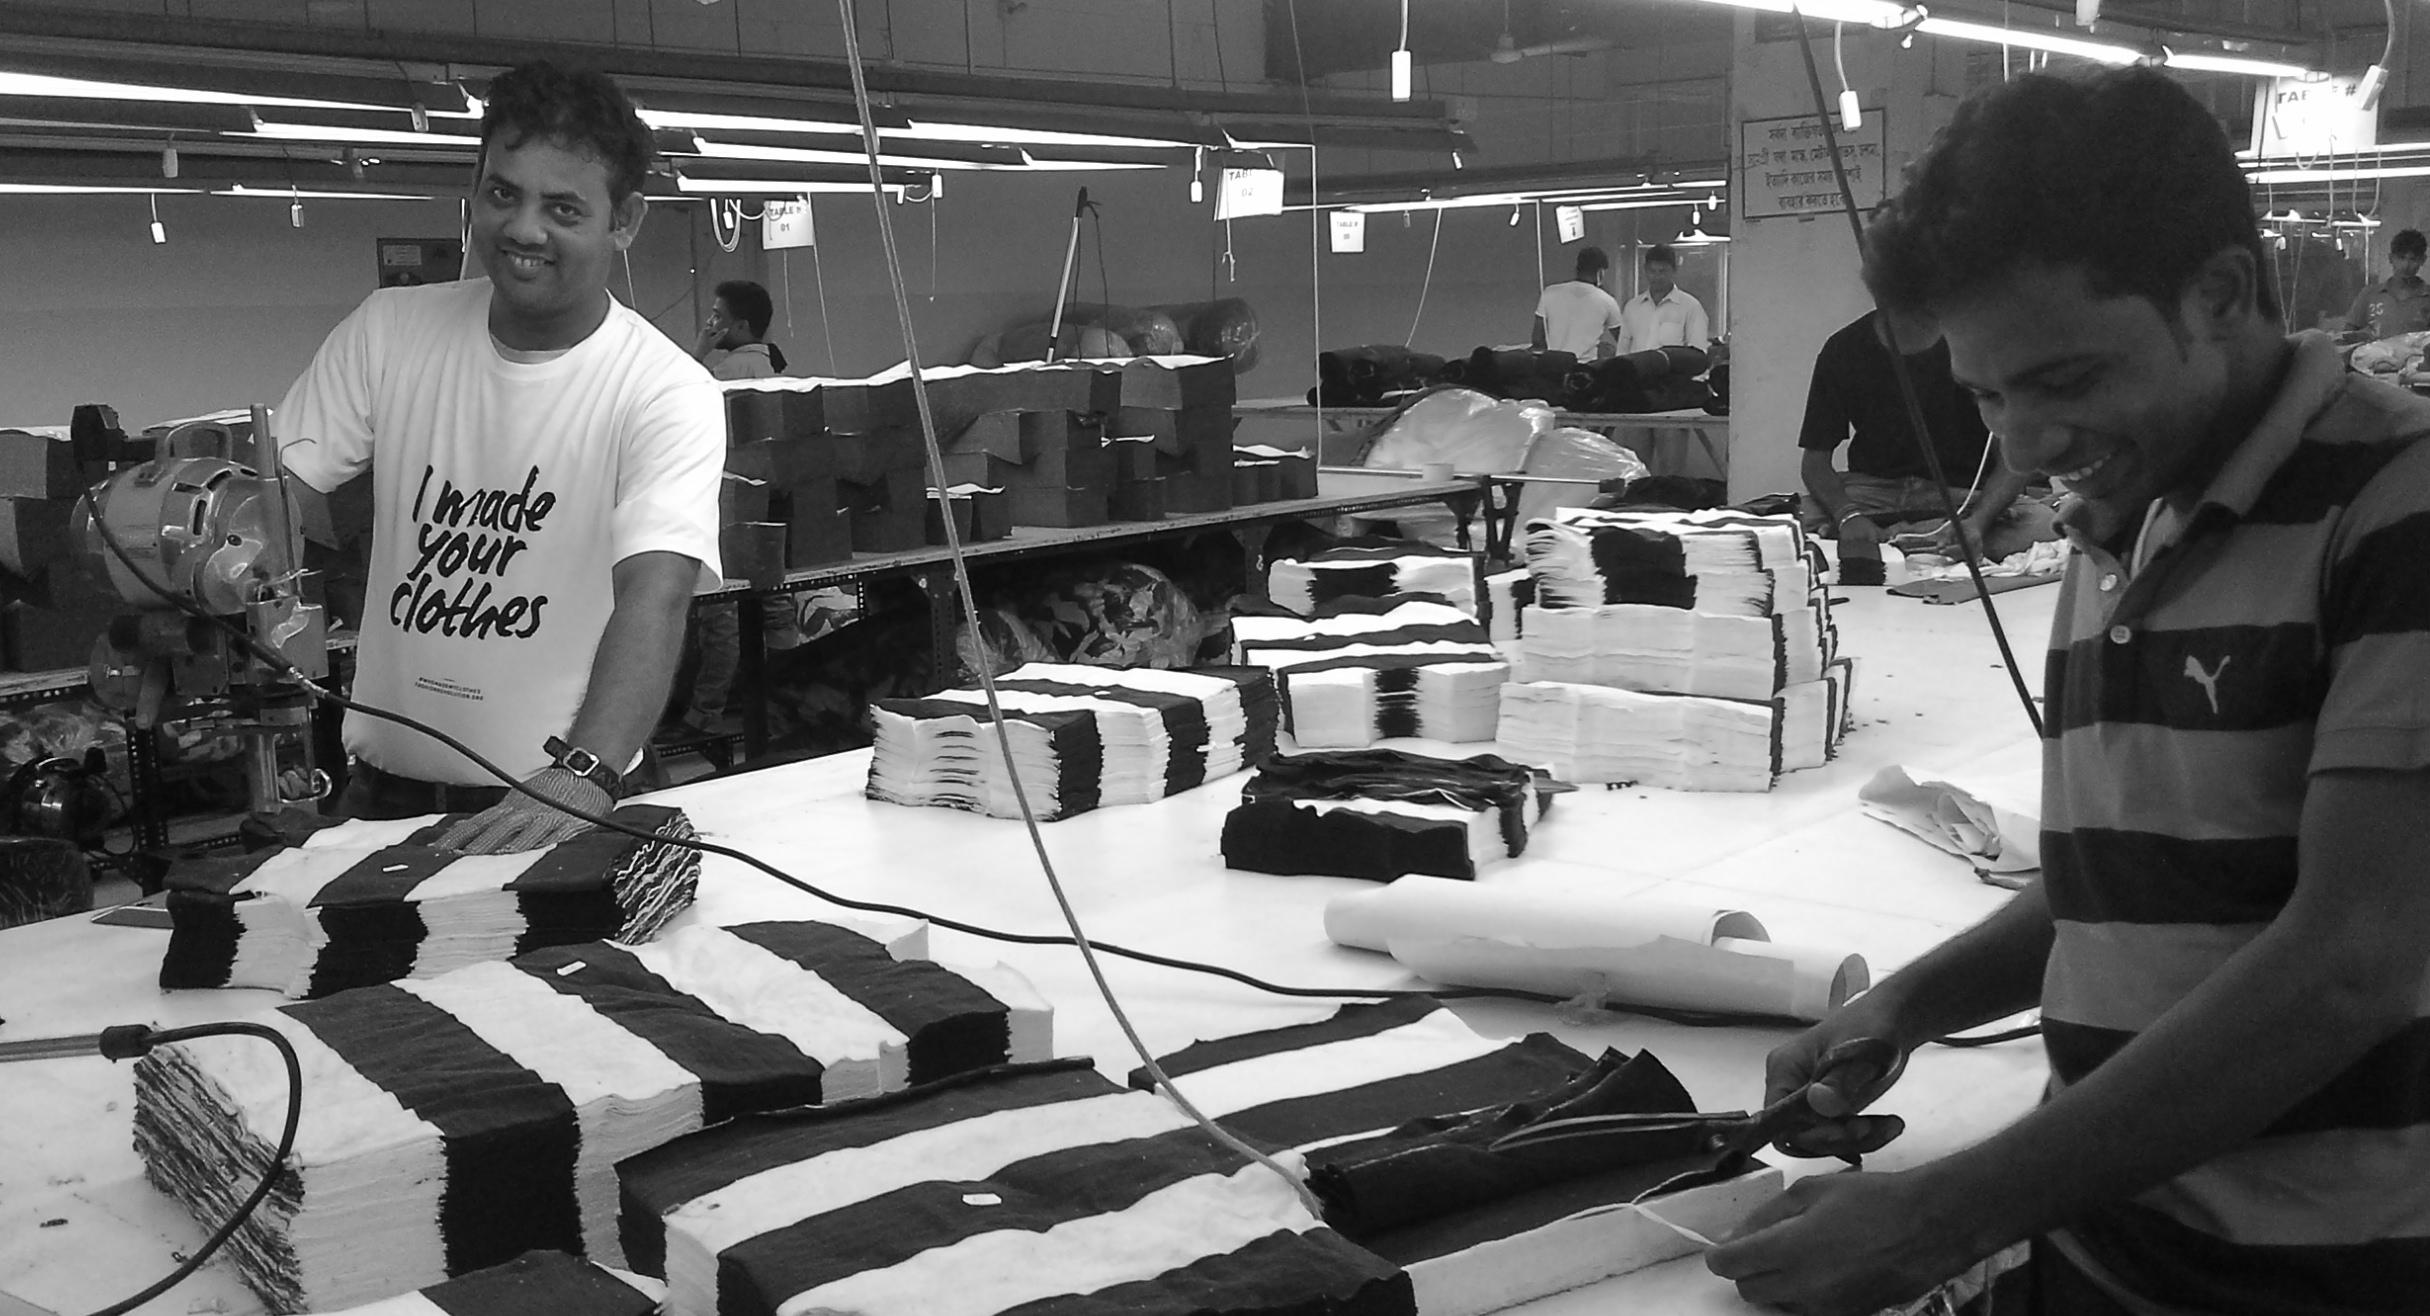 Cutting the fabric